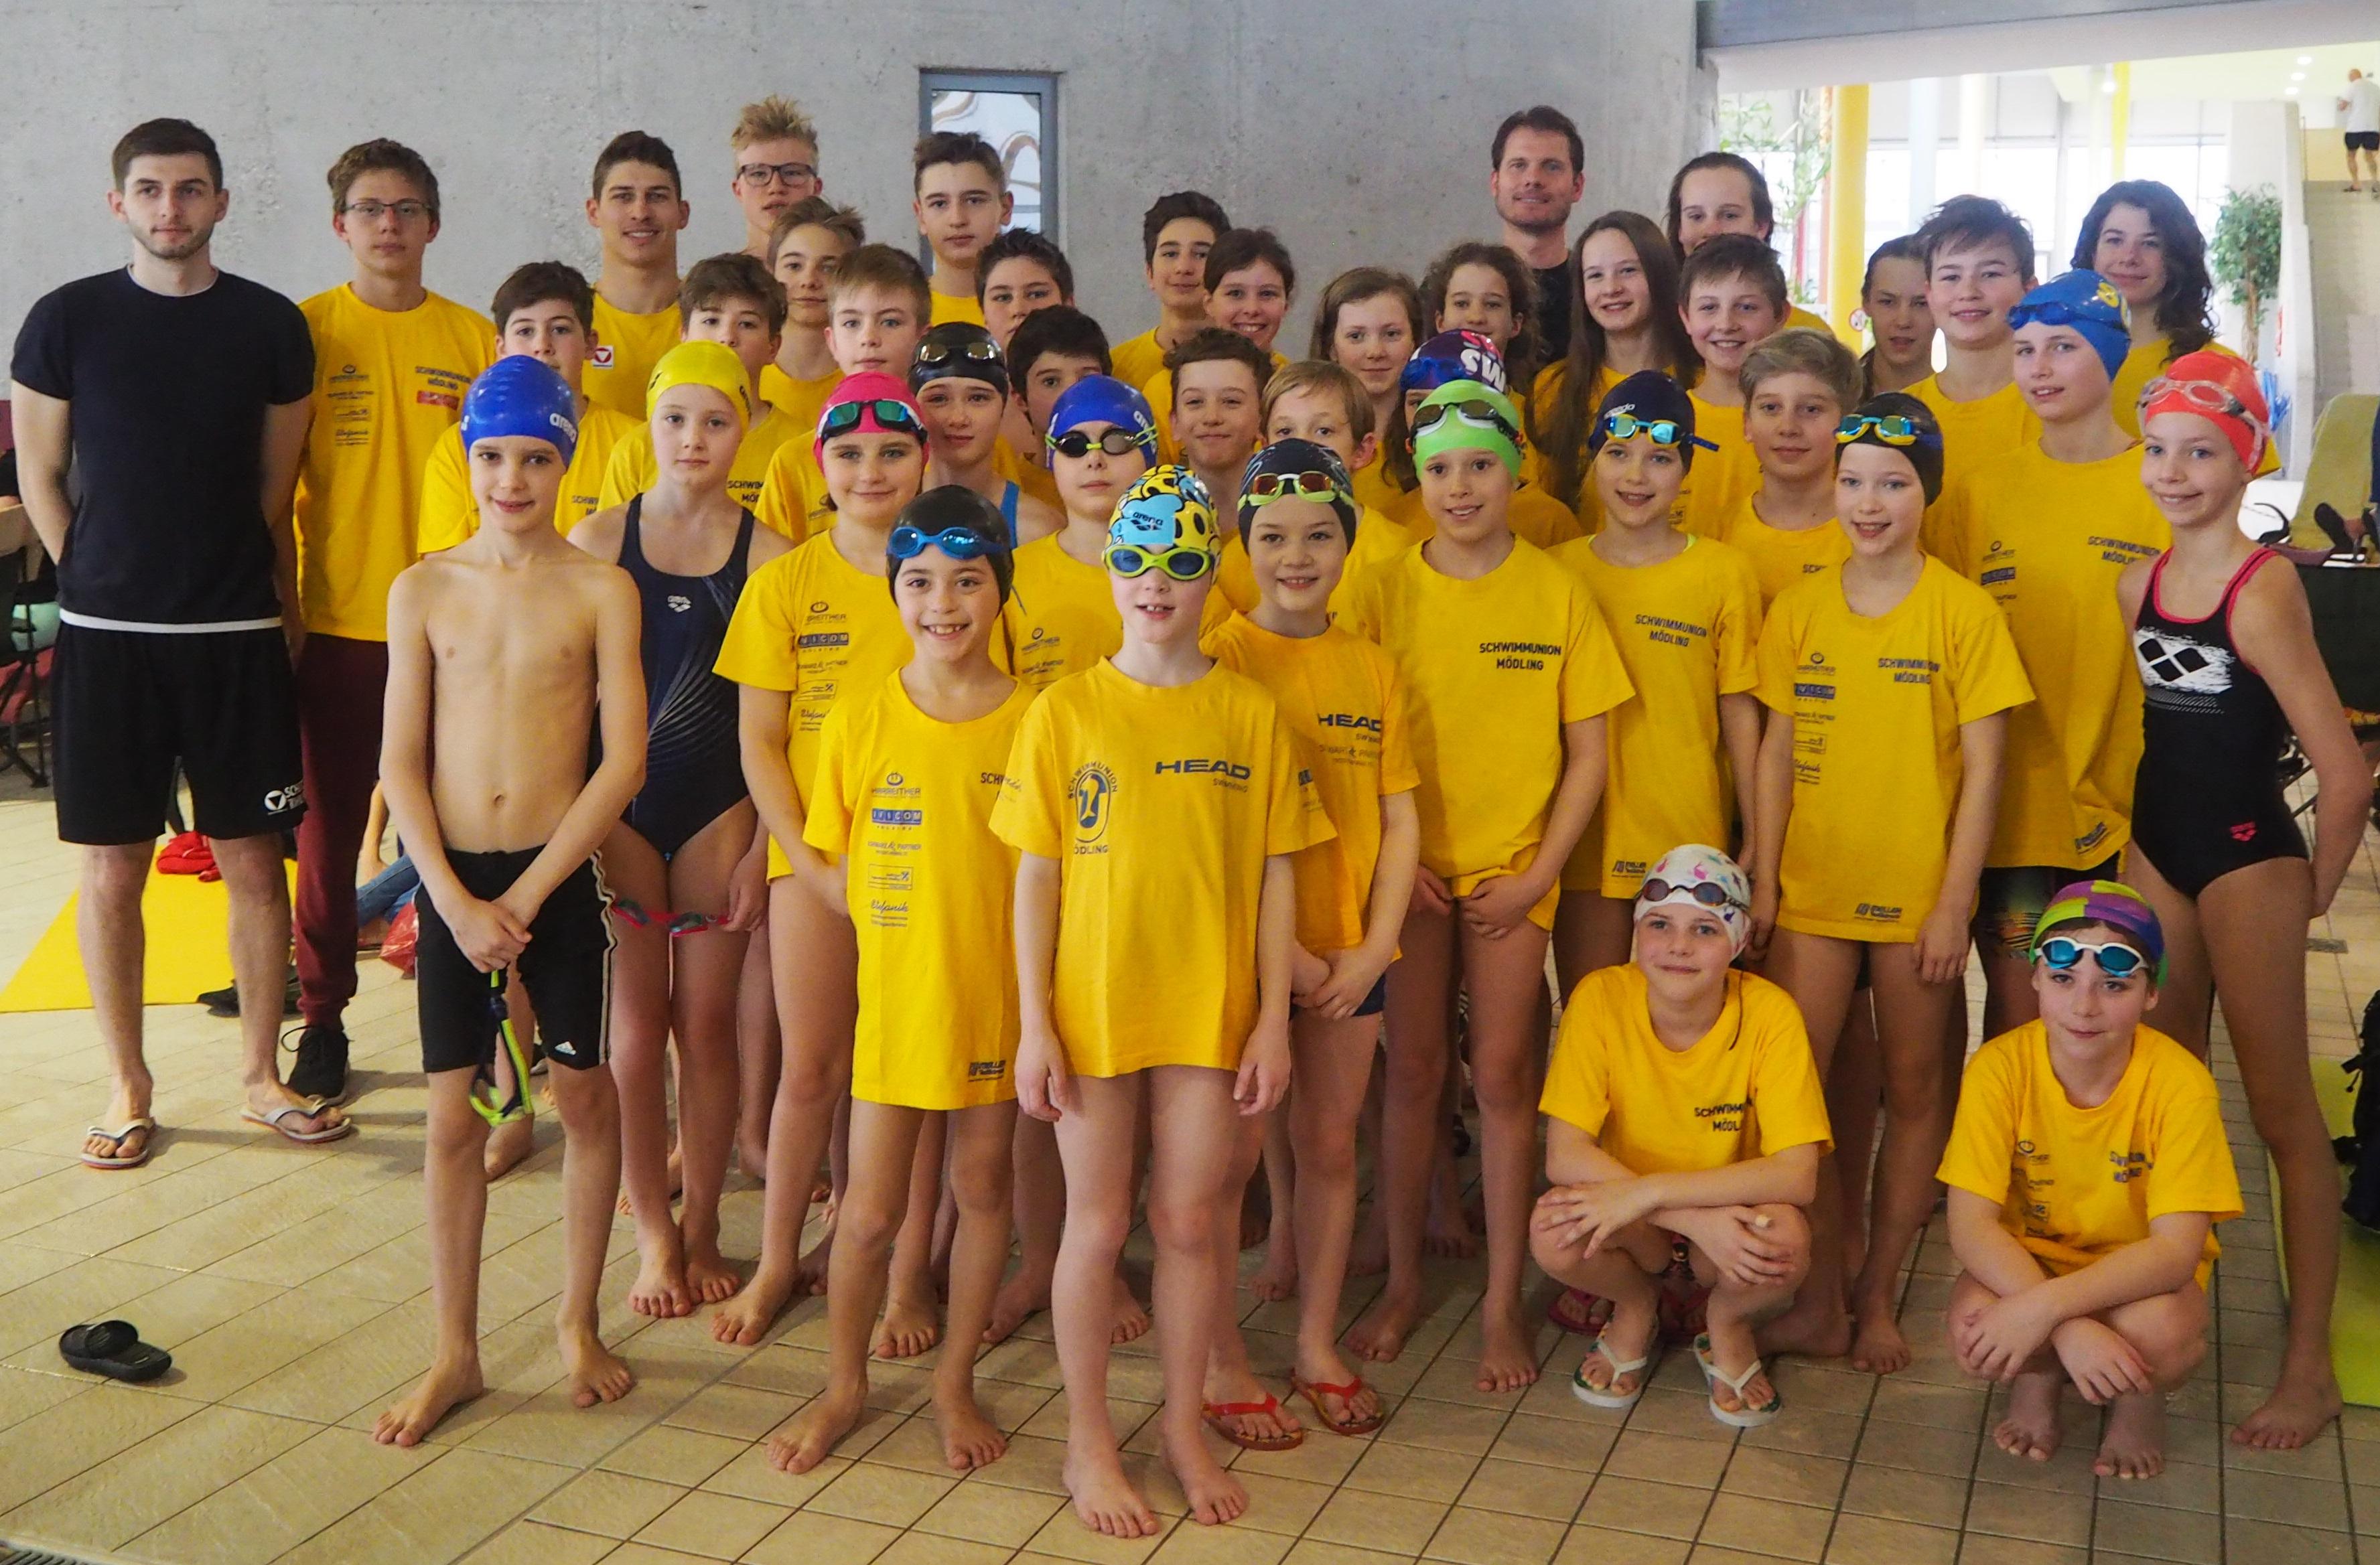 Nö. Landesmeisterschaften 2. Teil in Wiener Neustadt